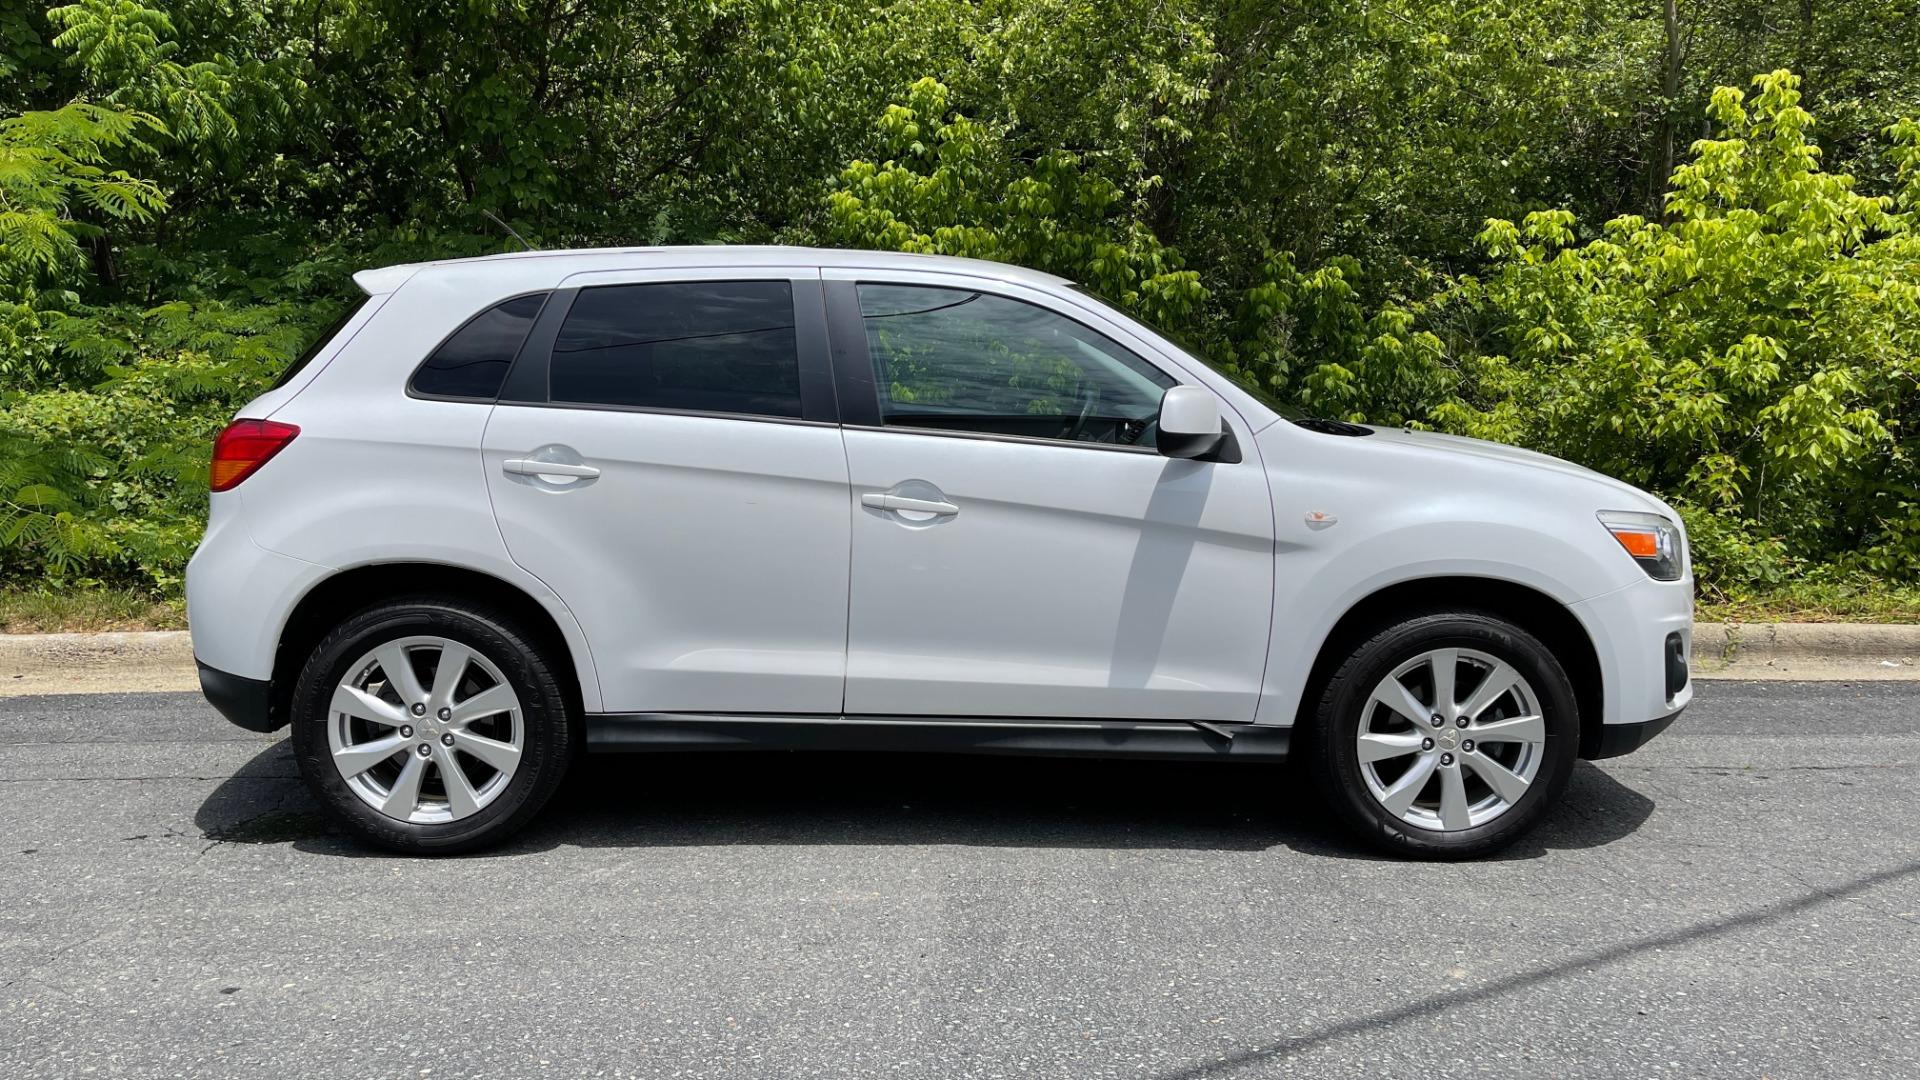 Used 2014 Mitsubishi OUTLANDER SPORT ES 2WD / 2.0L / CVT TRANS / 18IN WHEELS / 31MPG for sale $8,495 at Formula Imports in Charlotte NC 28227 6